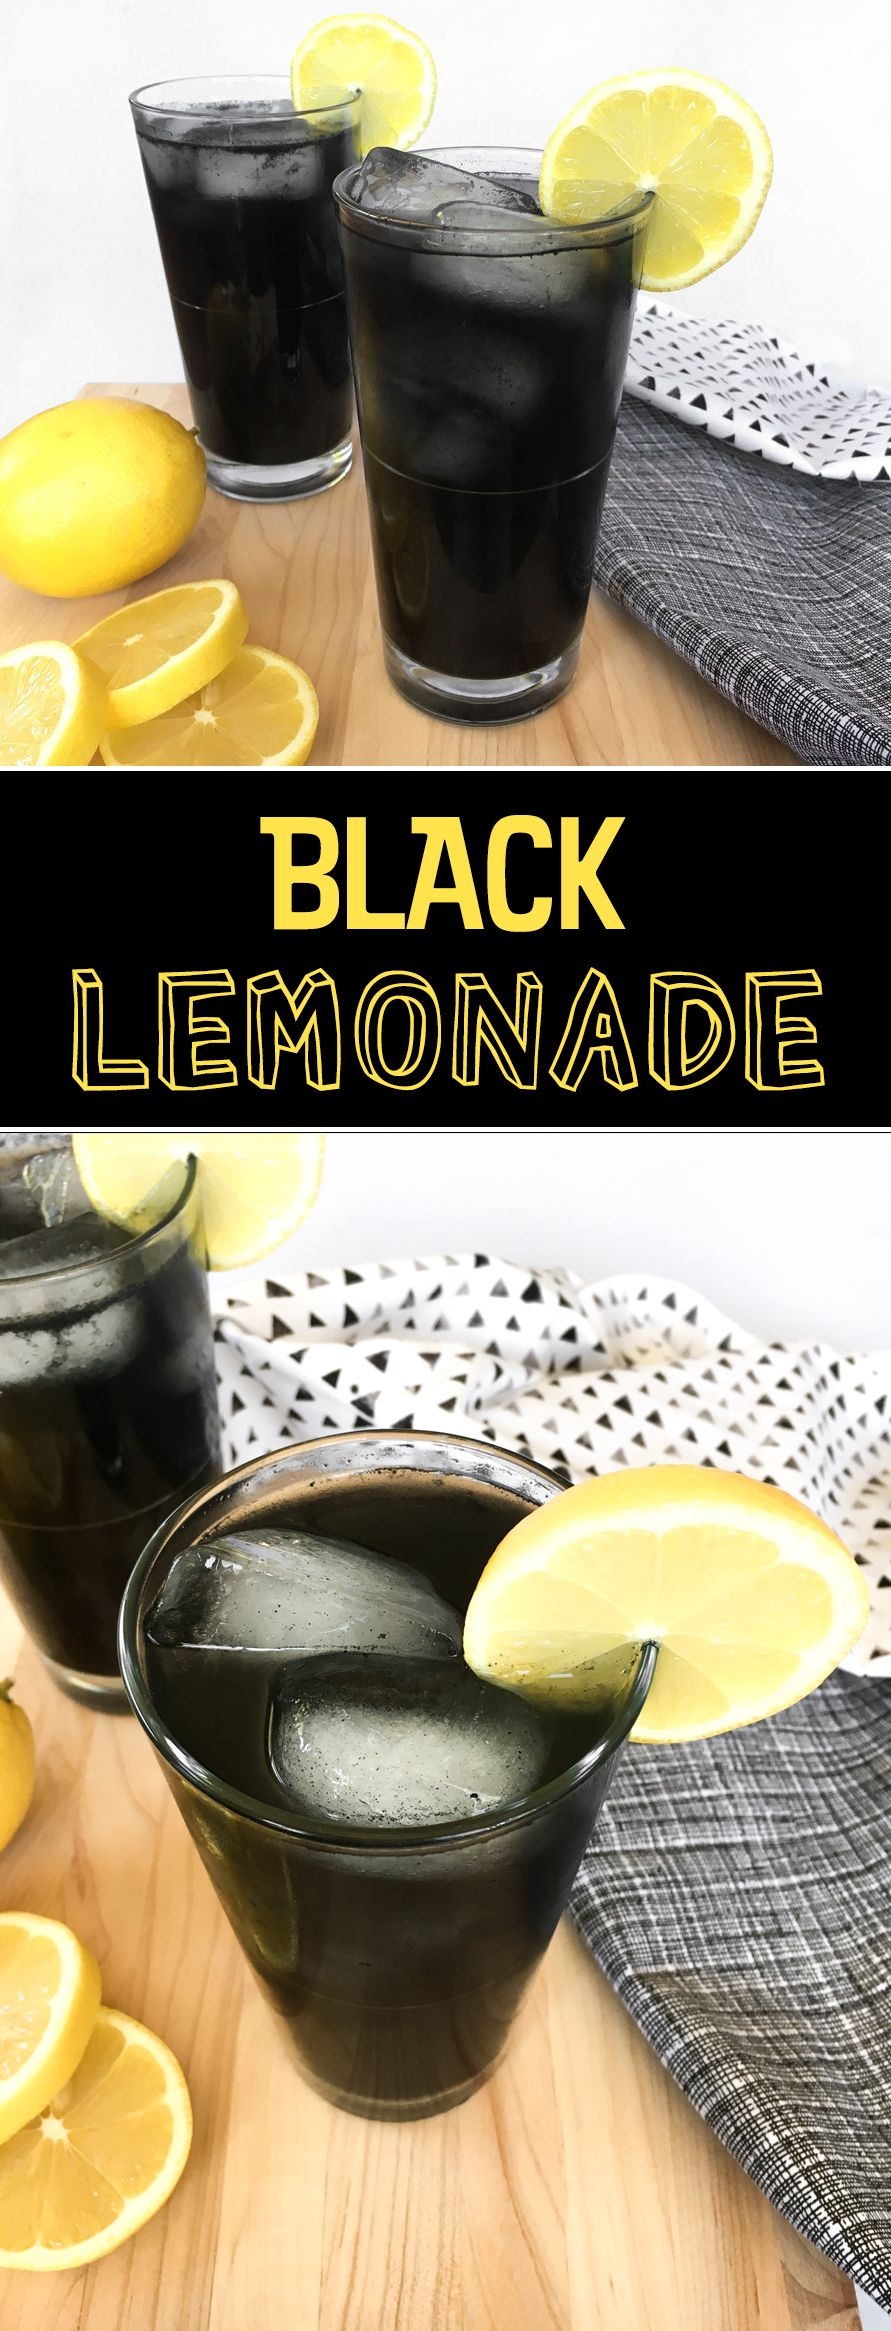 Black Lemonade | DIY Party Ideen | Pinterest | Halloween, Getränke ...